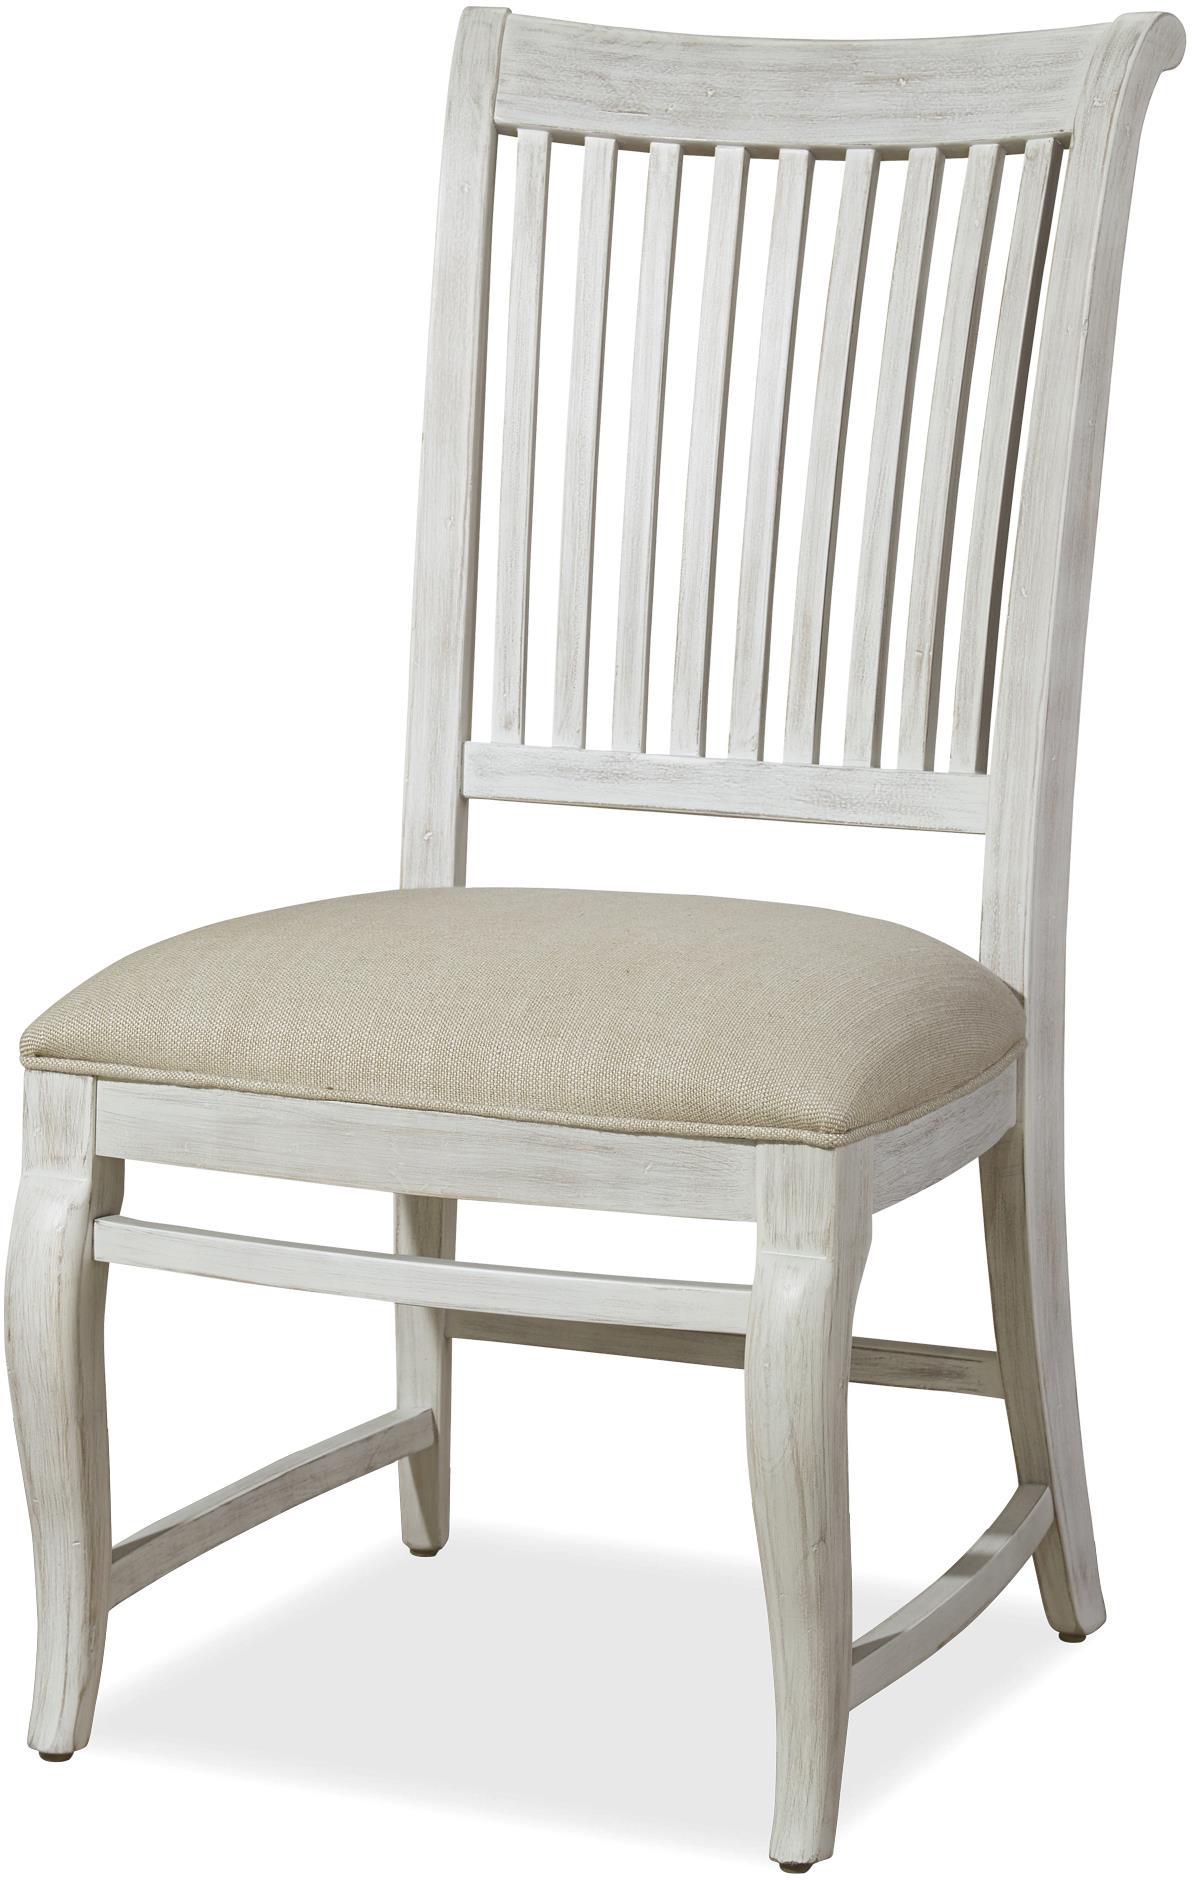 paula deen dogwood dining chairs iron throne chair backboard by universal 597634 rta side